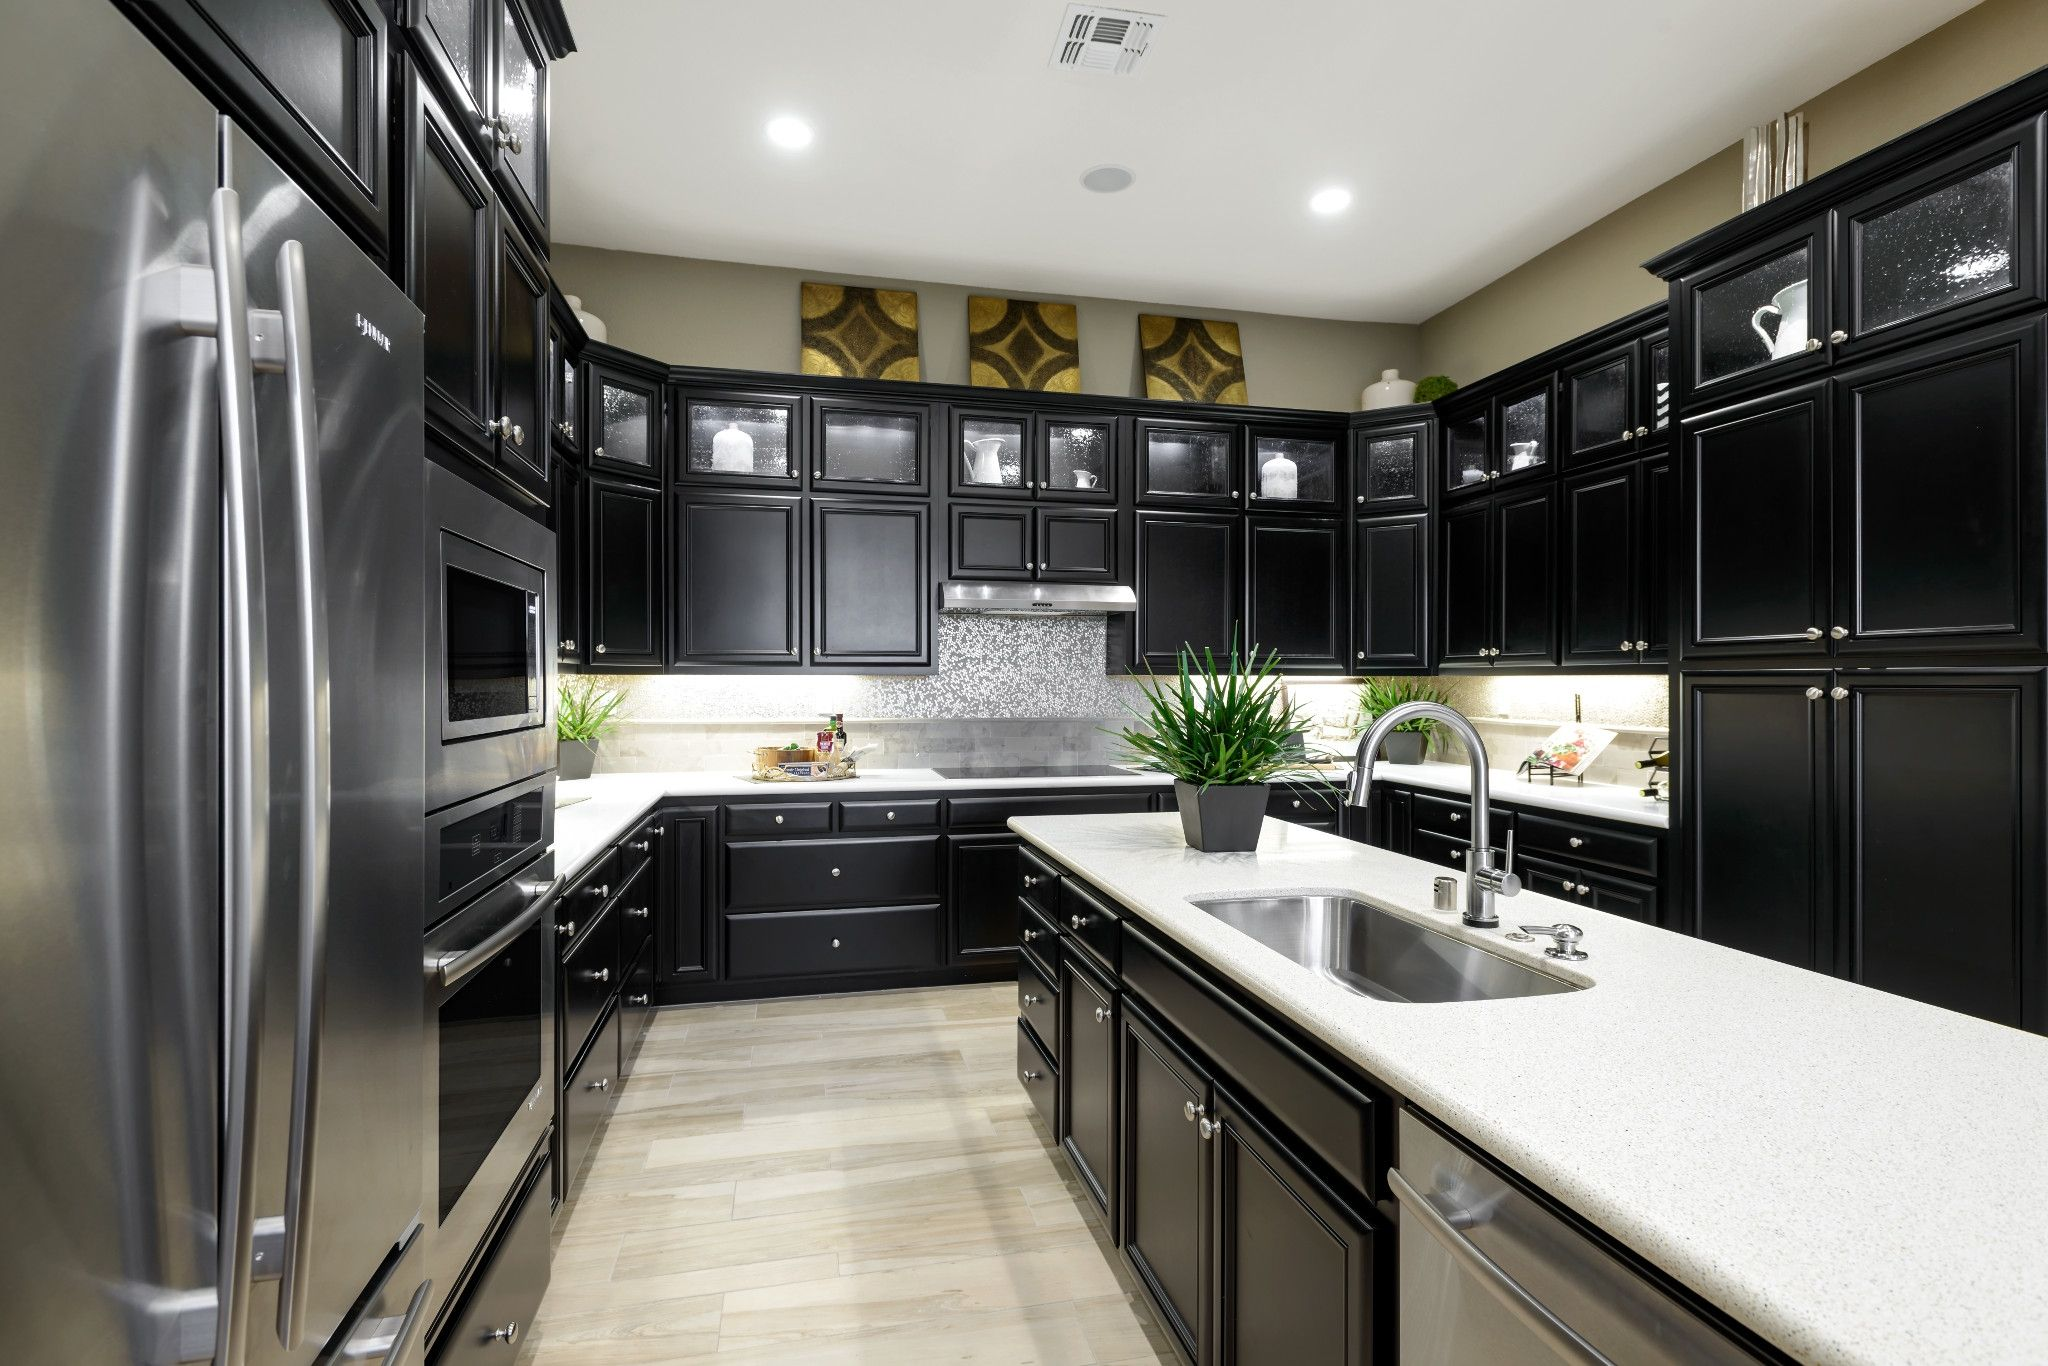 Kitchen-in-Vensa-at-Trilogy® at Rio Vista-in-Rio Vista